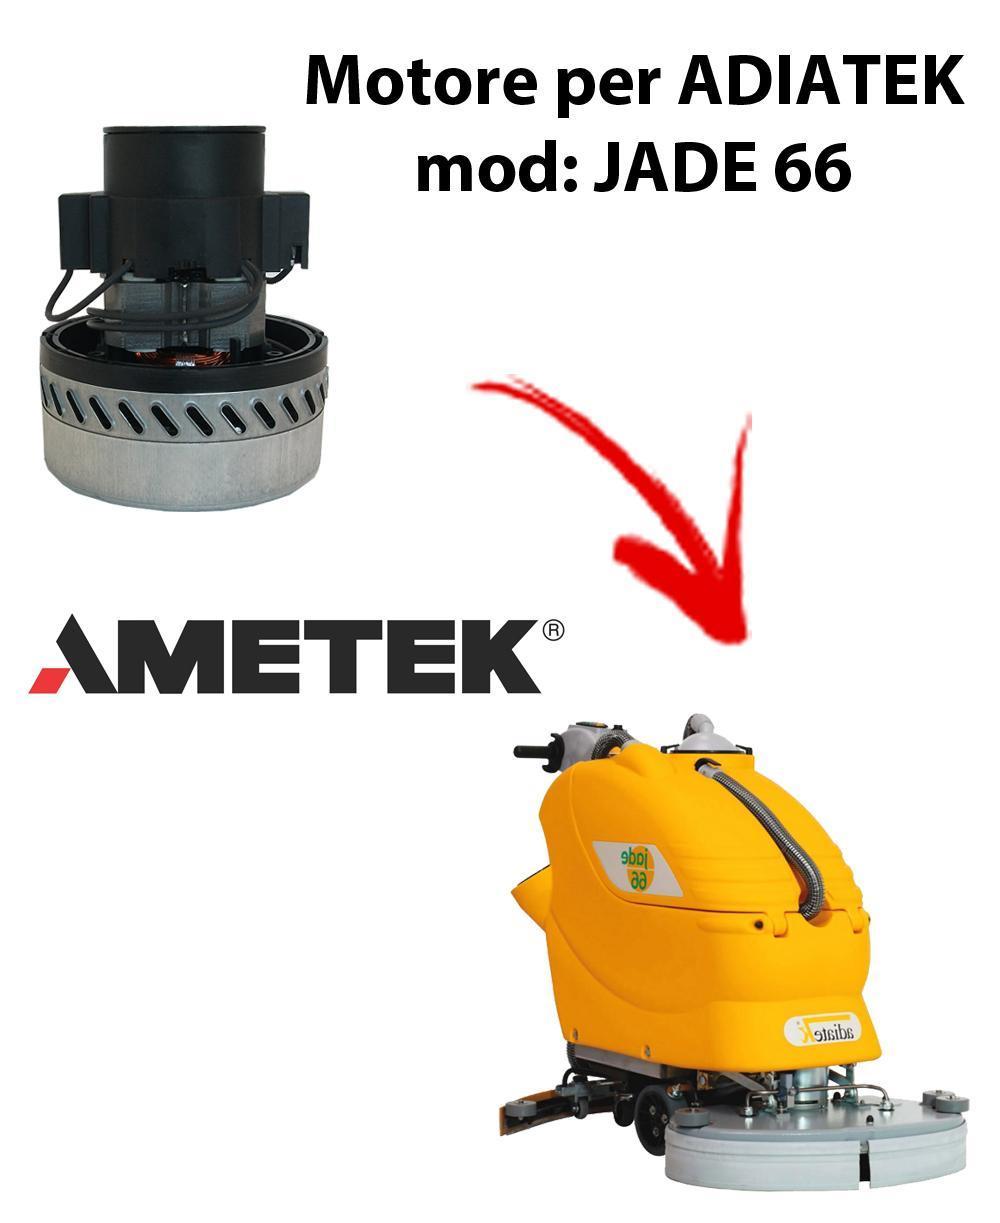 Jade 66 Motore de aspiración Ametek Italia  para fregadora Adiatek